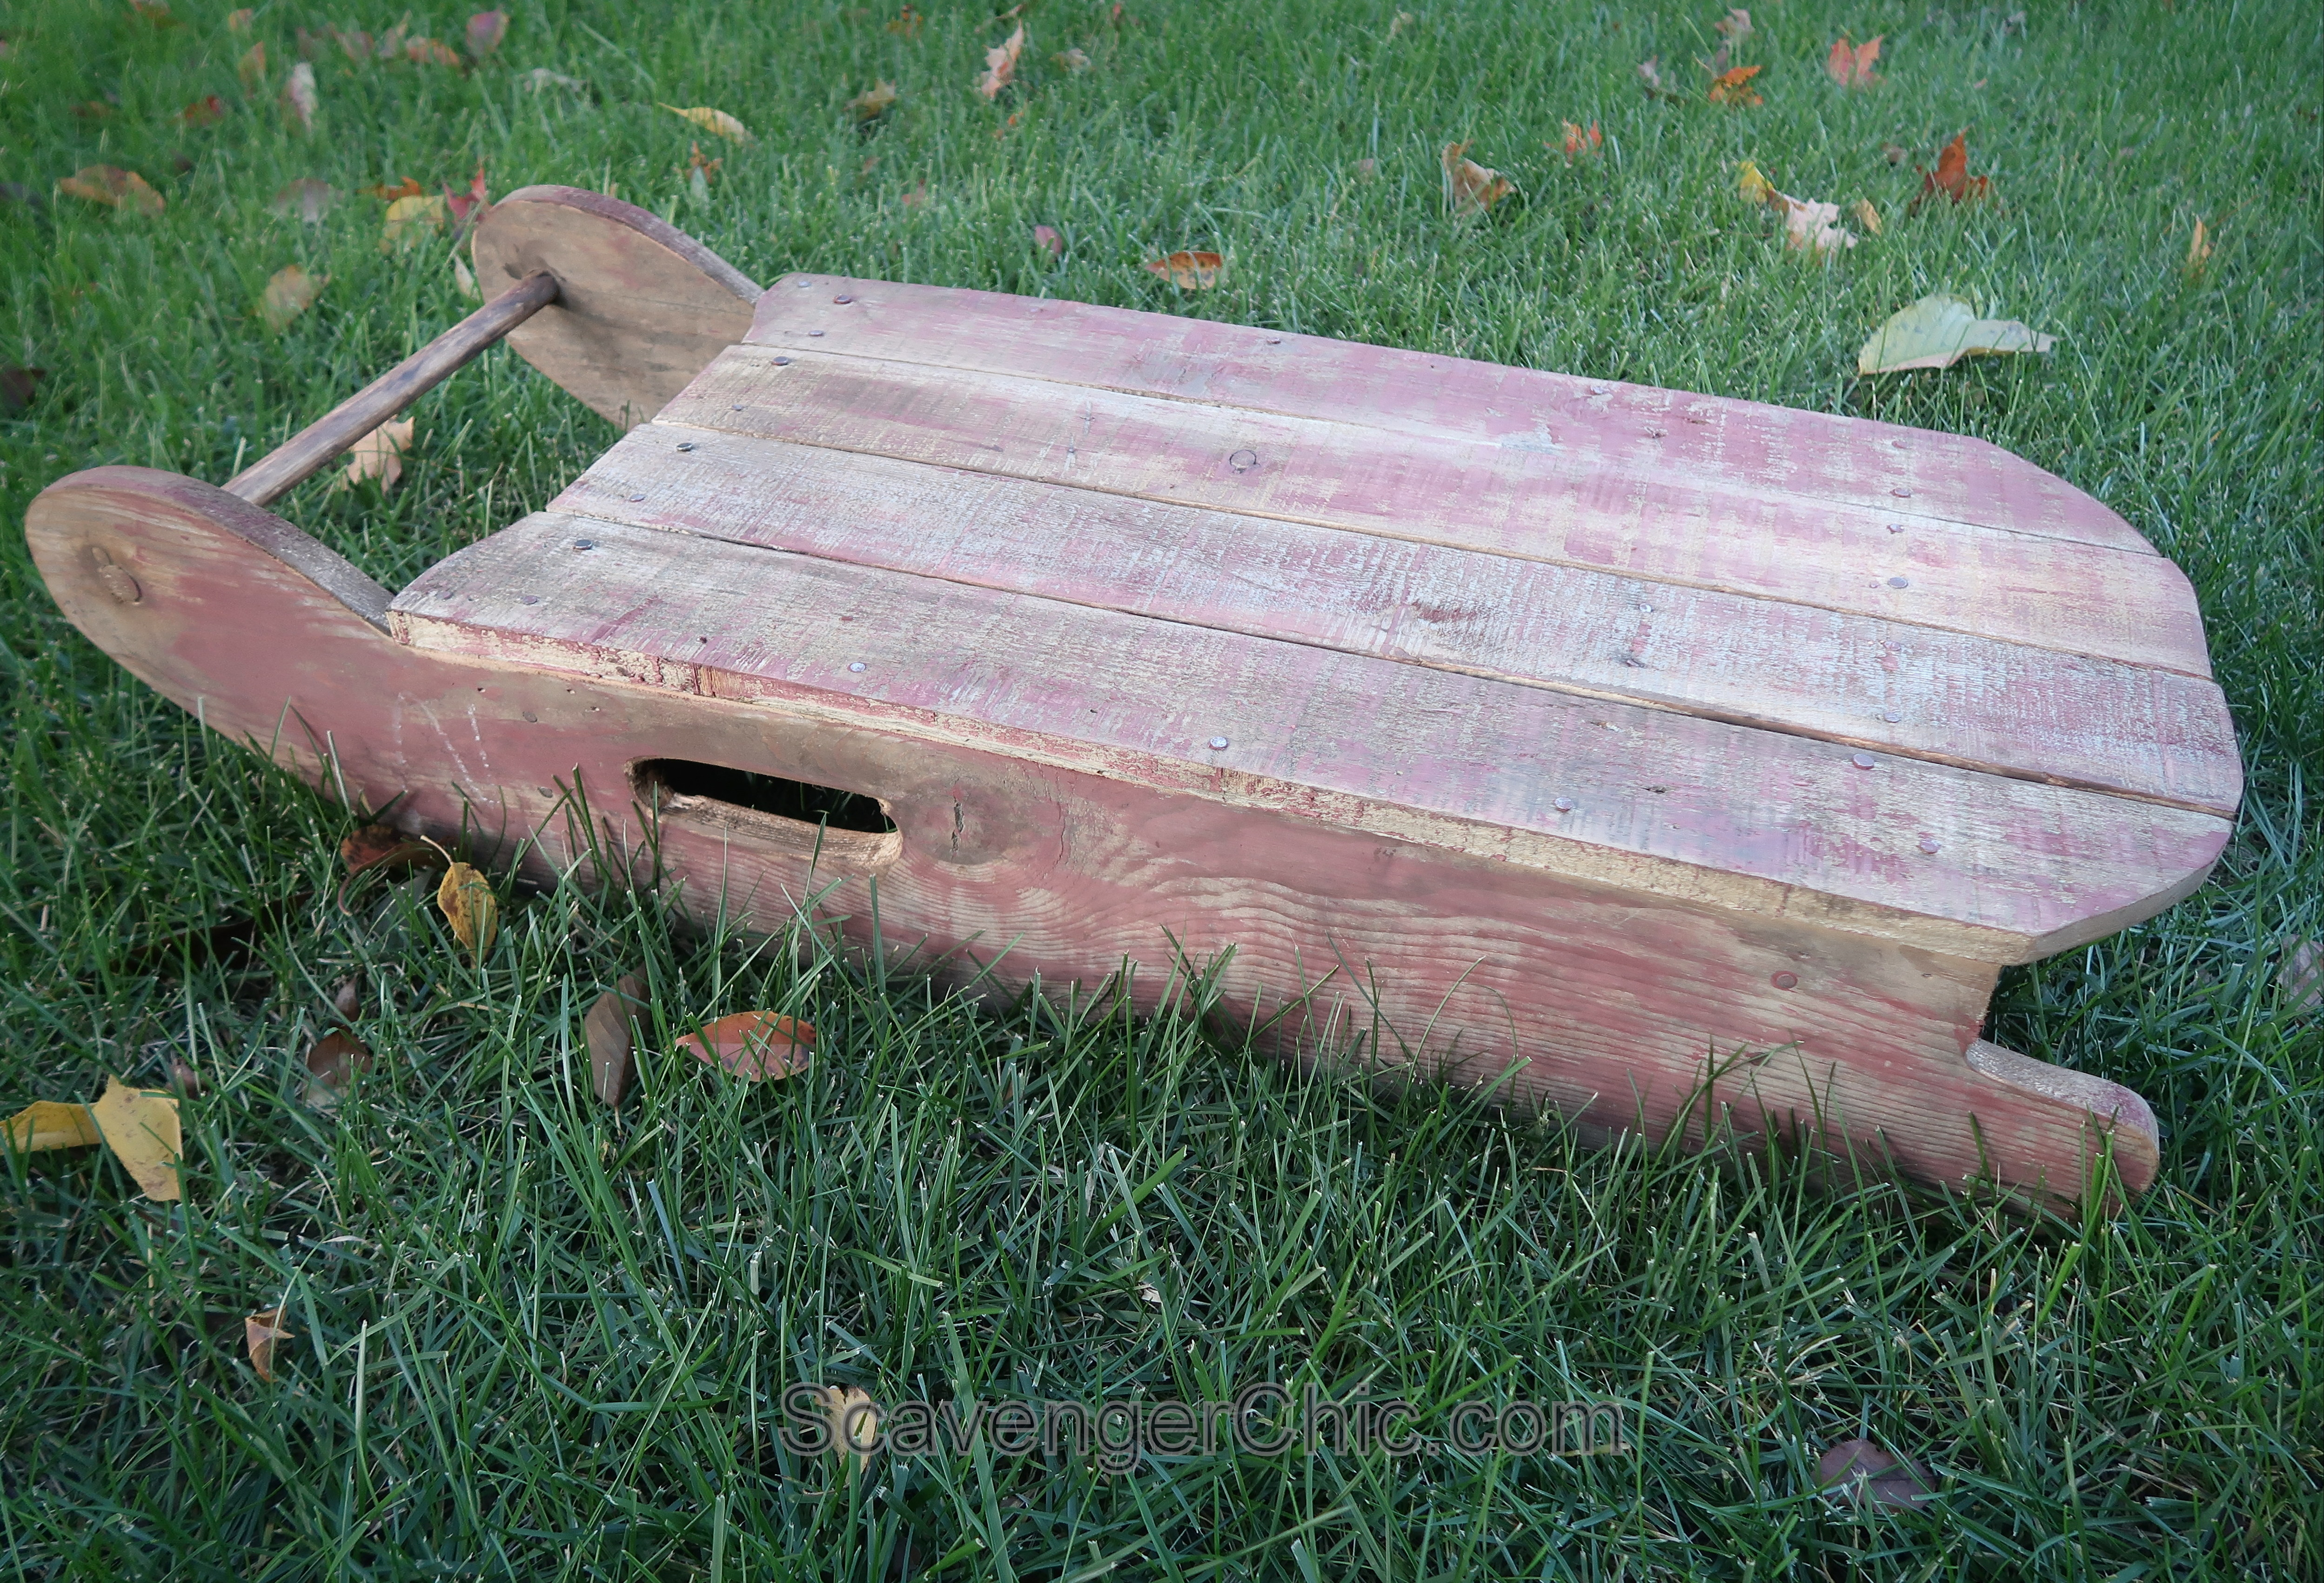 Make Your Own Wooden Vintage Sled Scavenger Chic